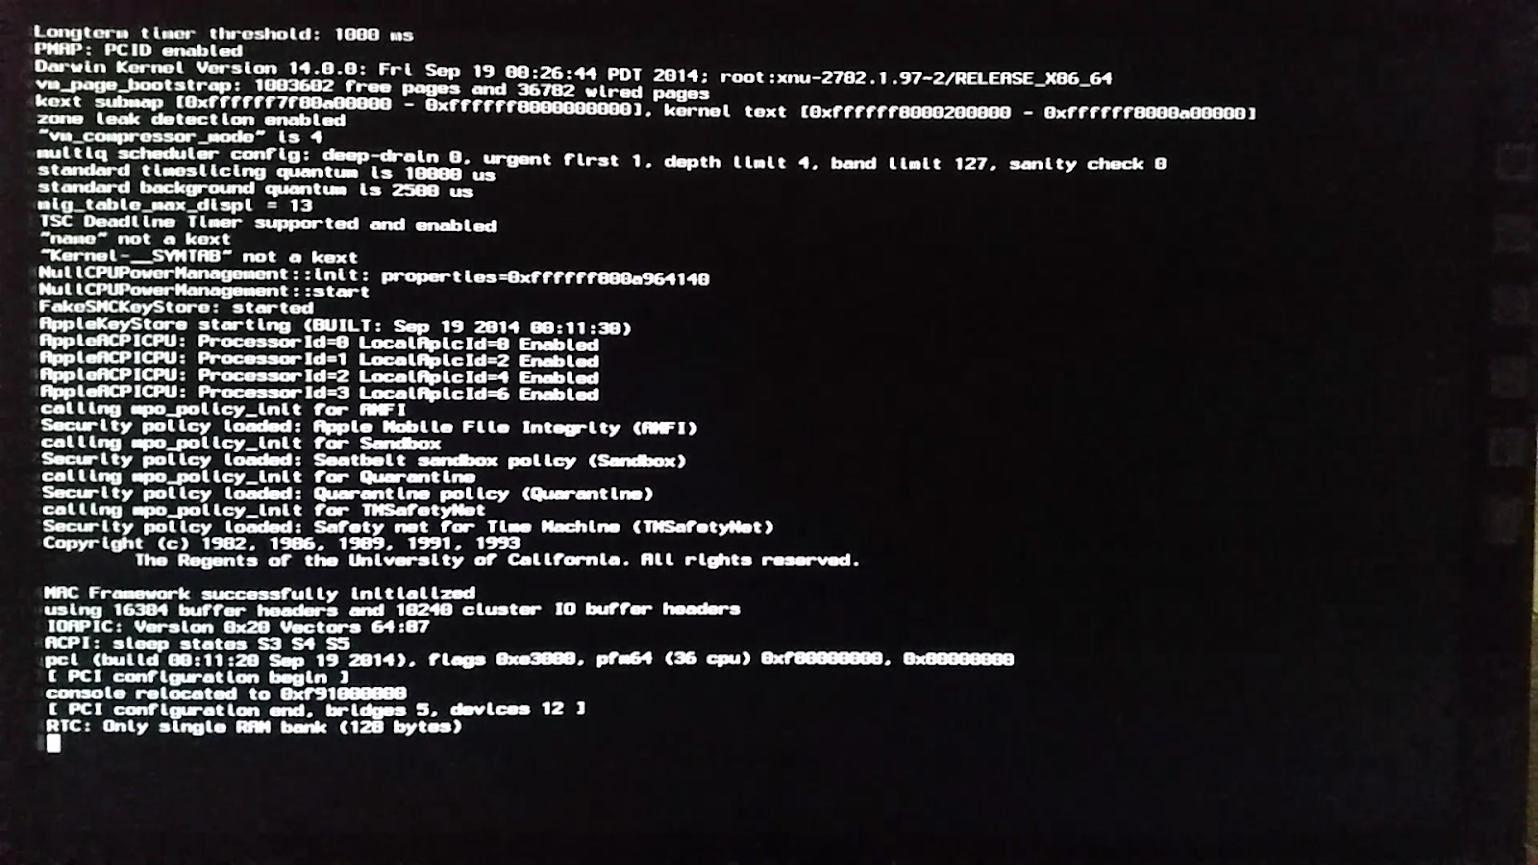 Screenshot_2014-11-04-11-59-09.png